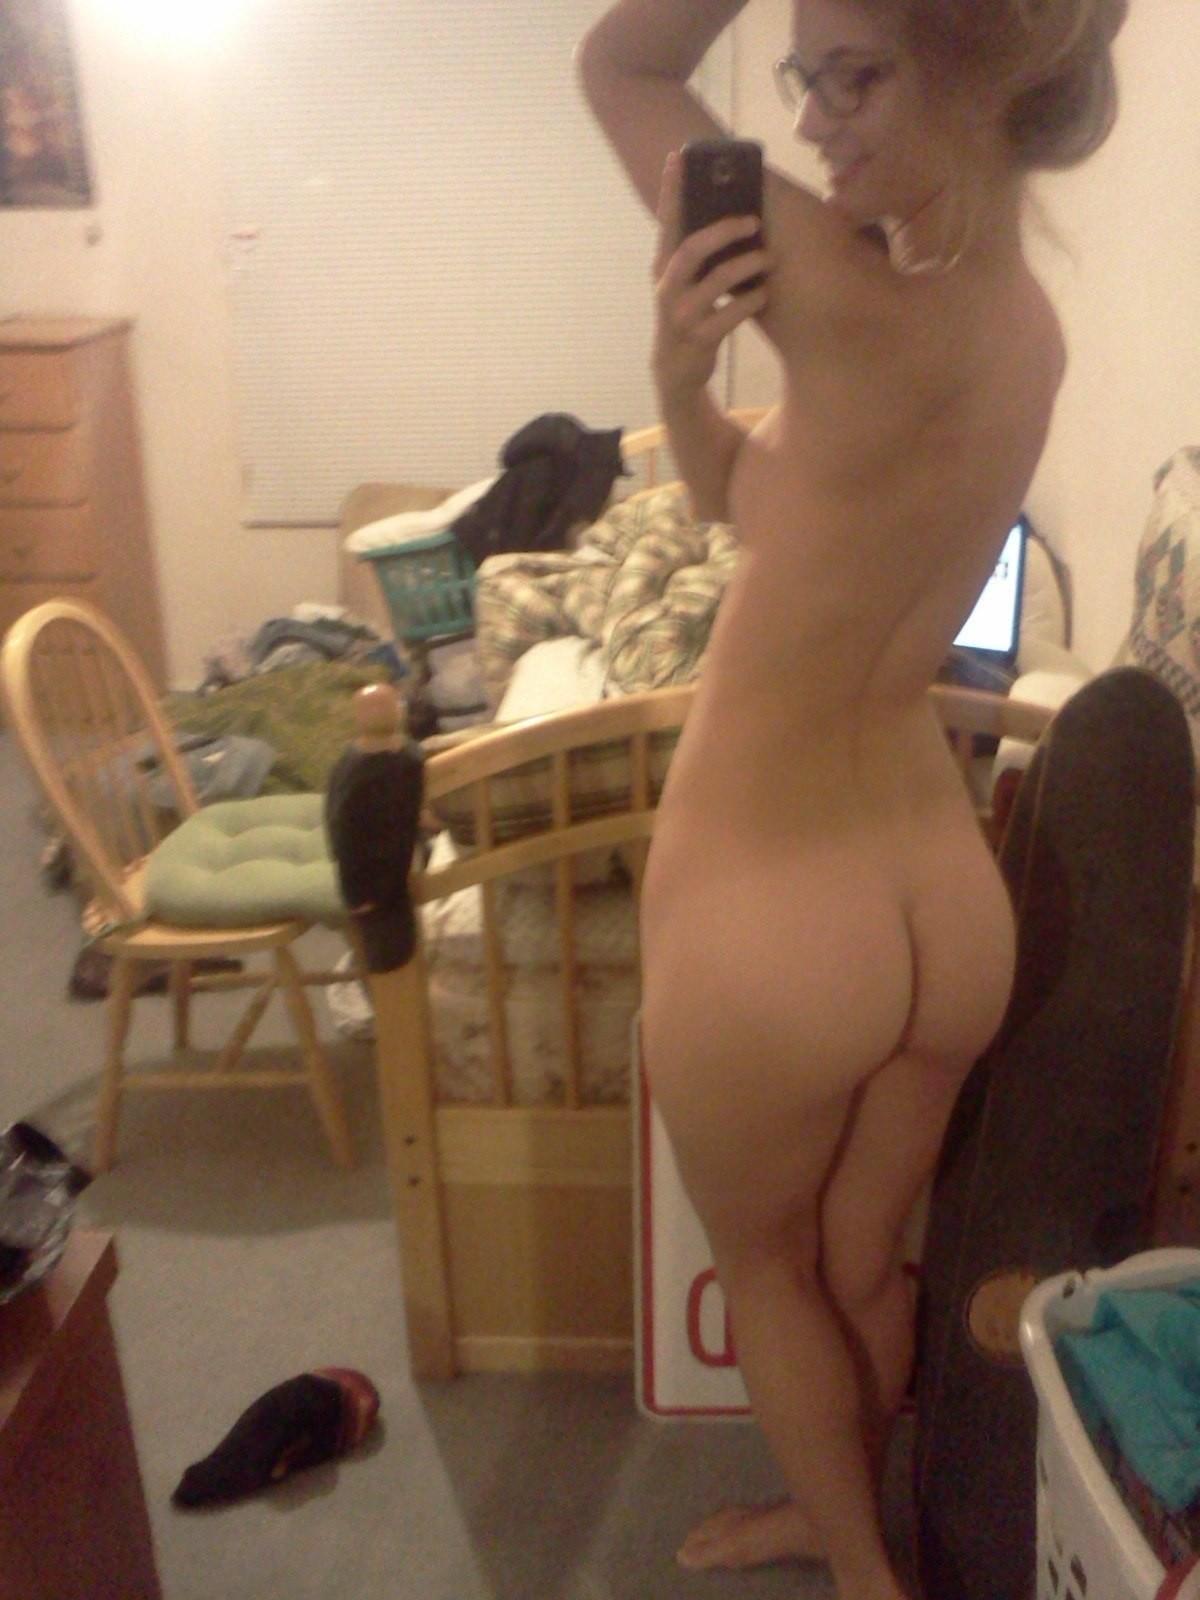 nude-selfie-mirror-girls-selfshot-young-mix-vol6-34